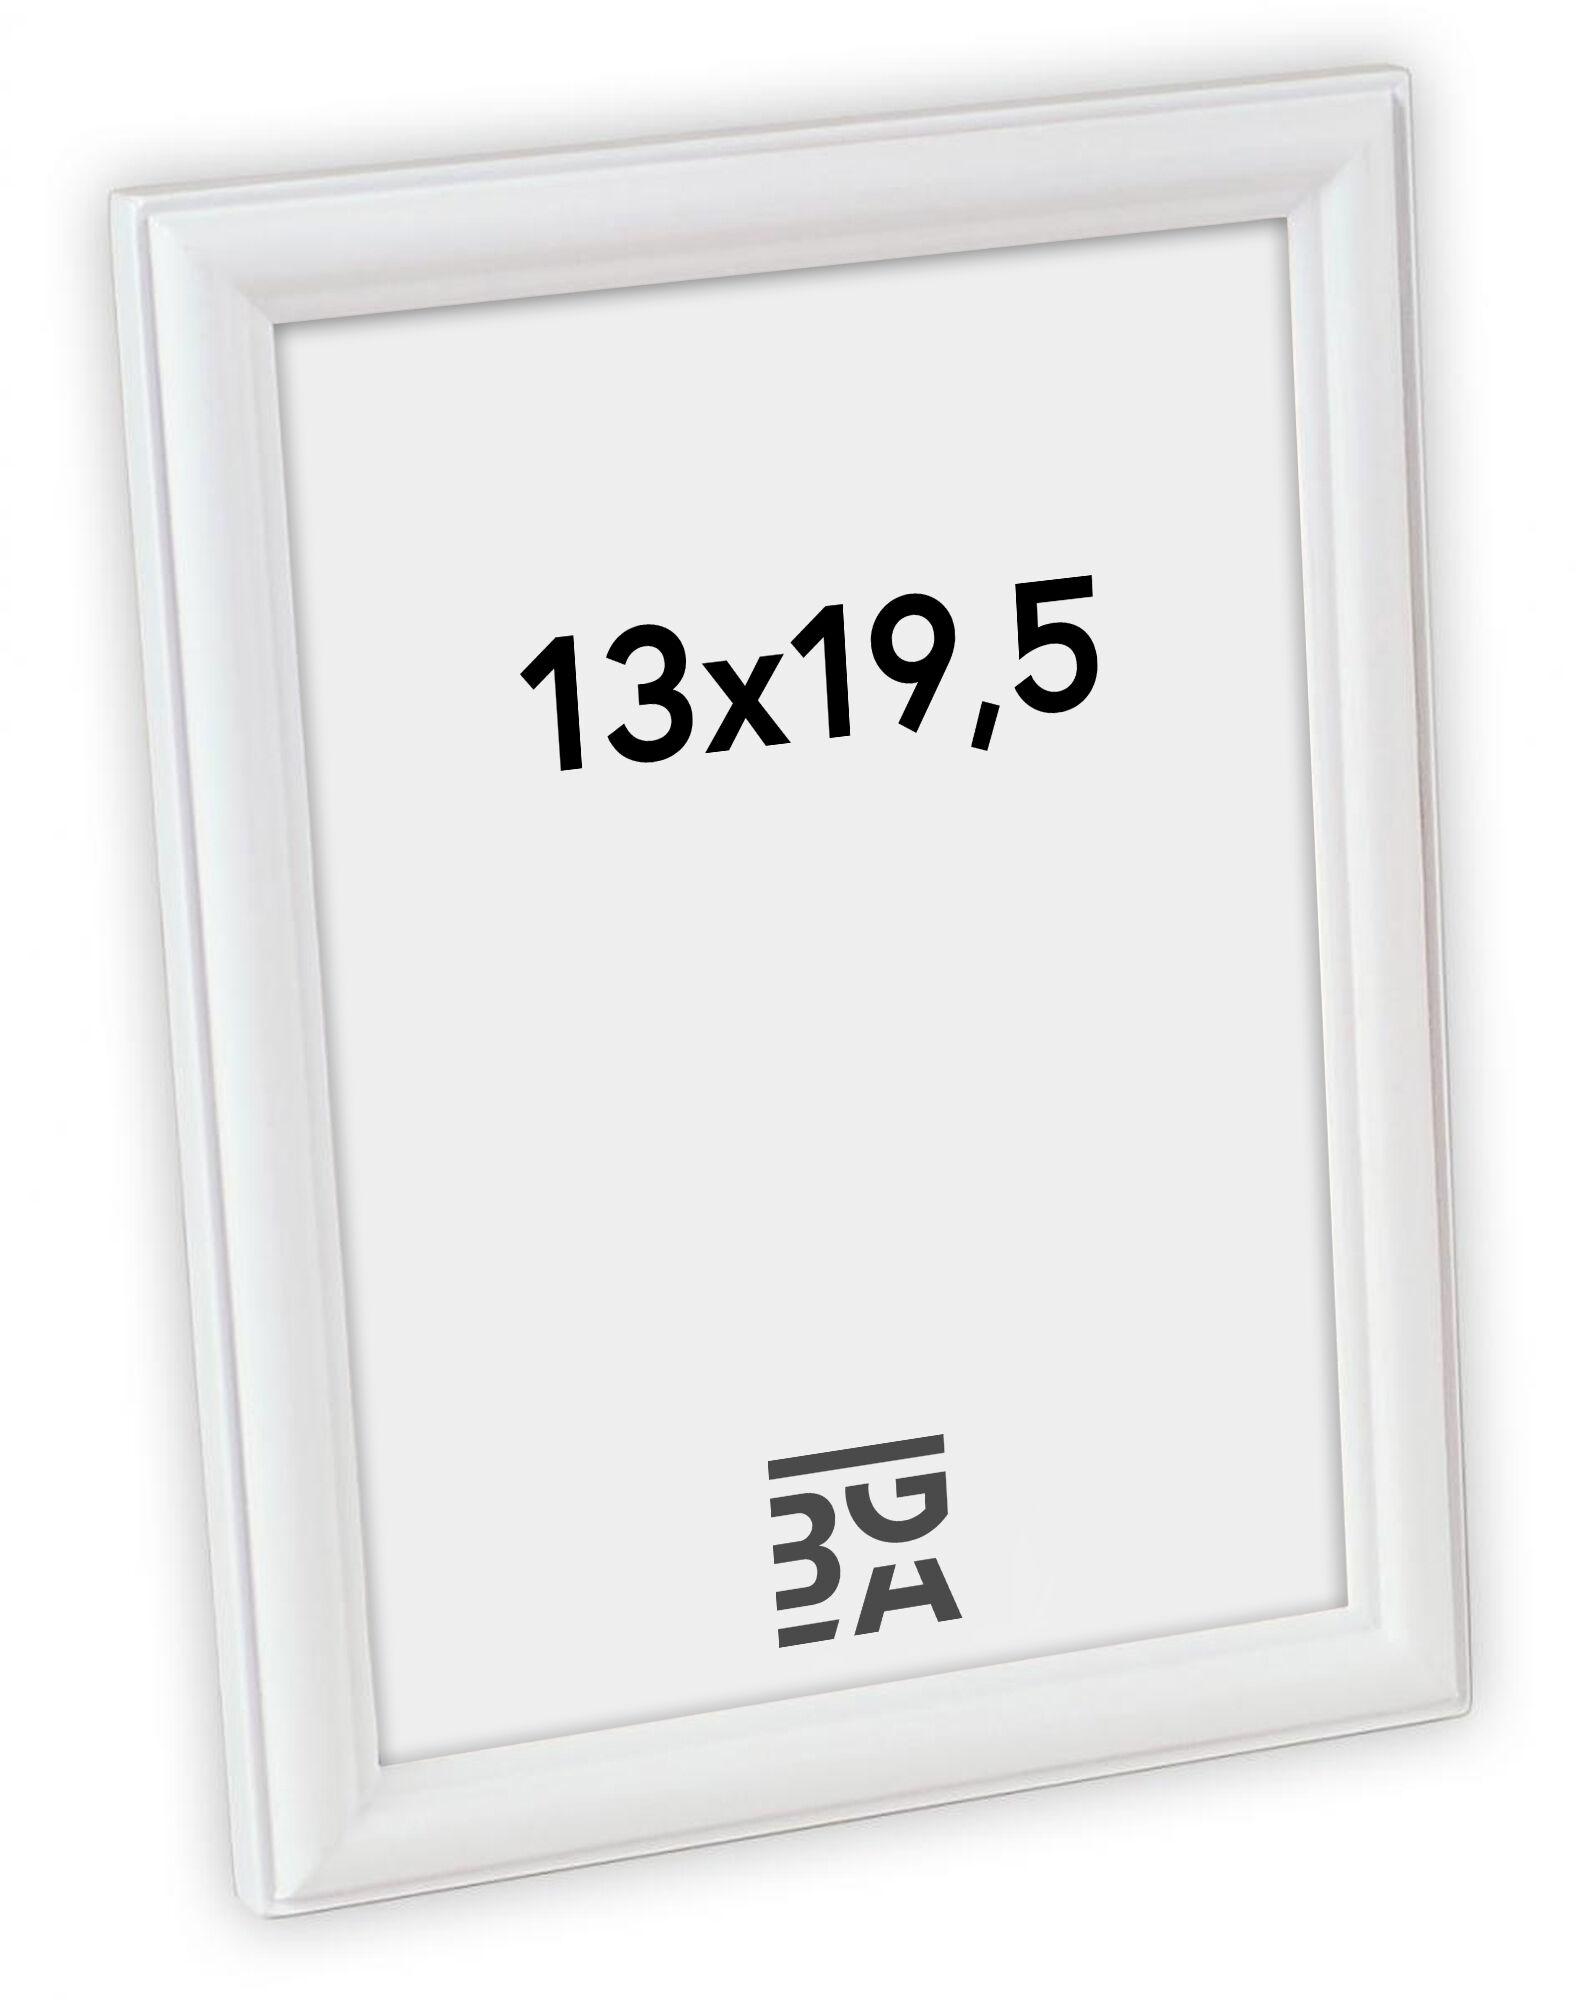 Image of Artlink - Special Line Valkoinen 13x19,5 cm